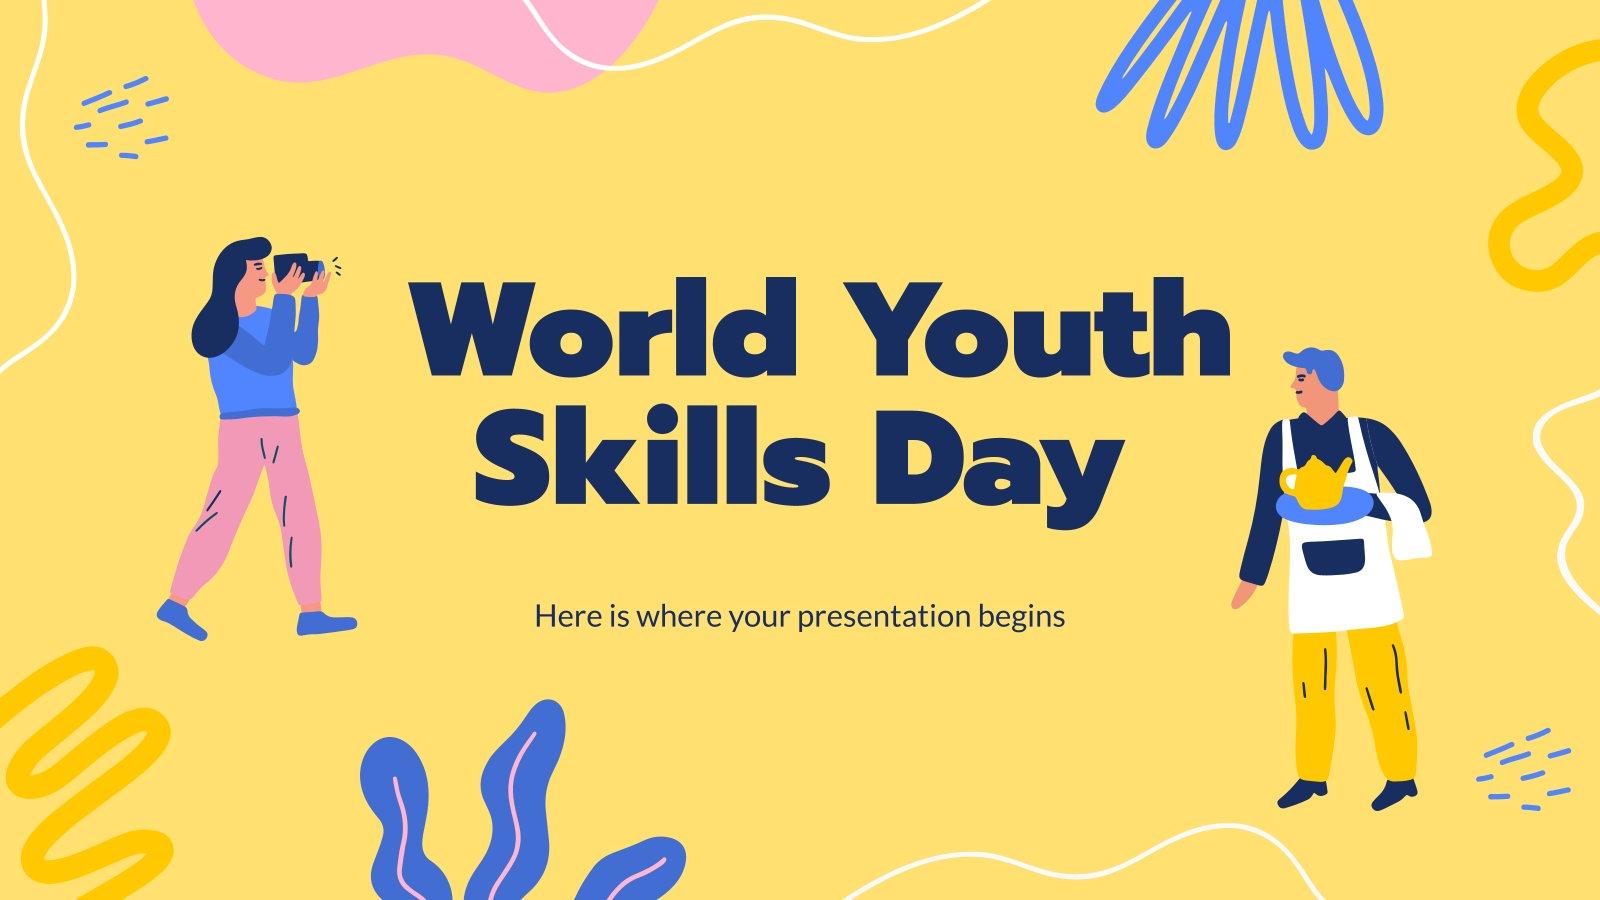 World Youth Skills Day presentation template